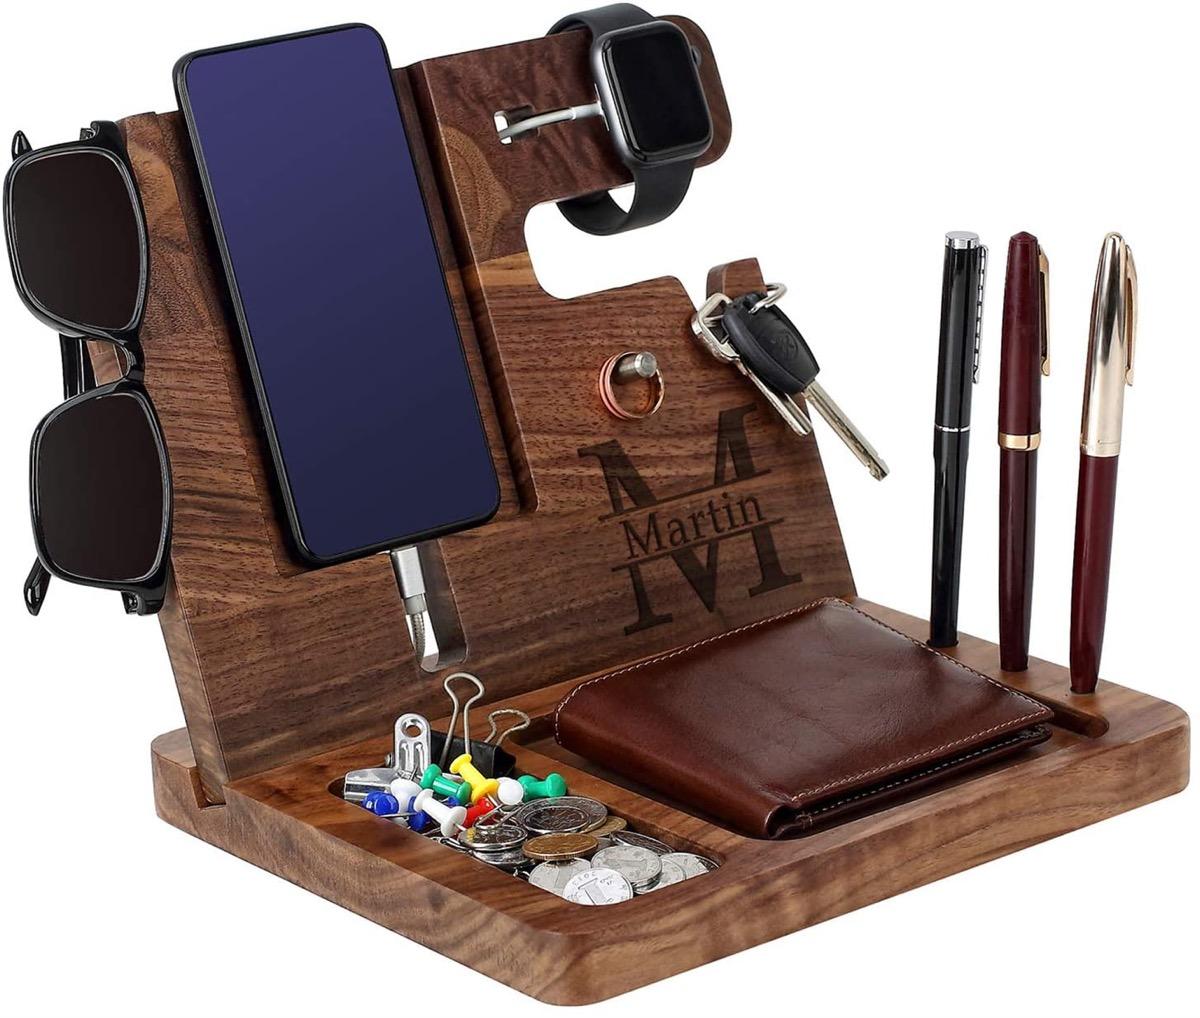 Phone docking station with men's essentials